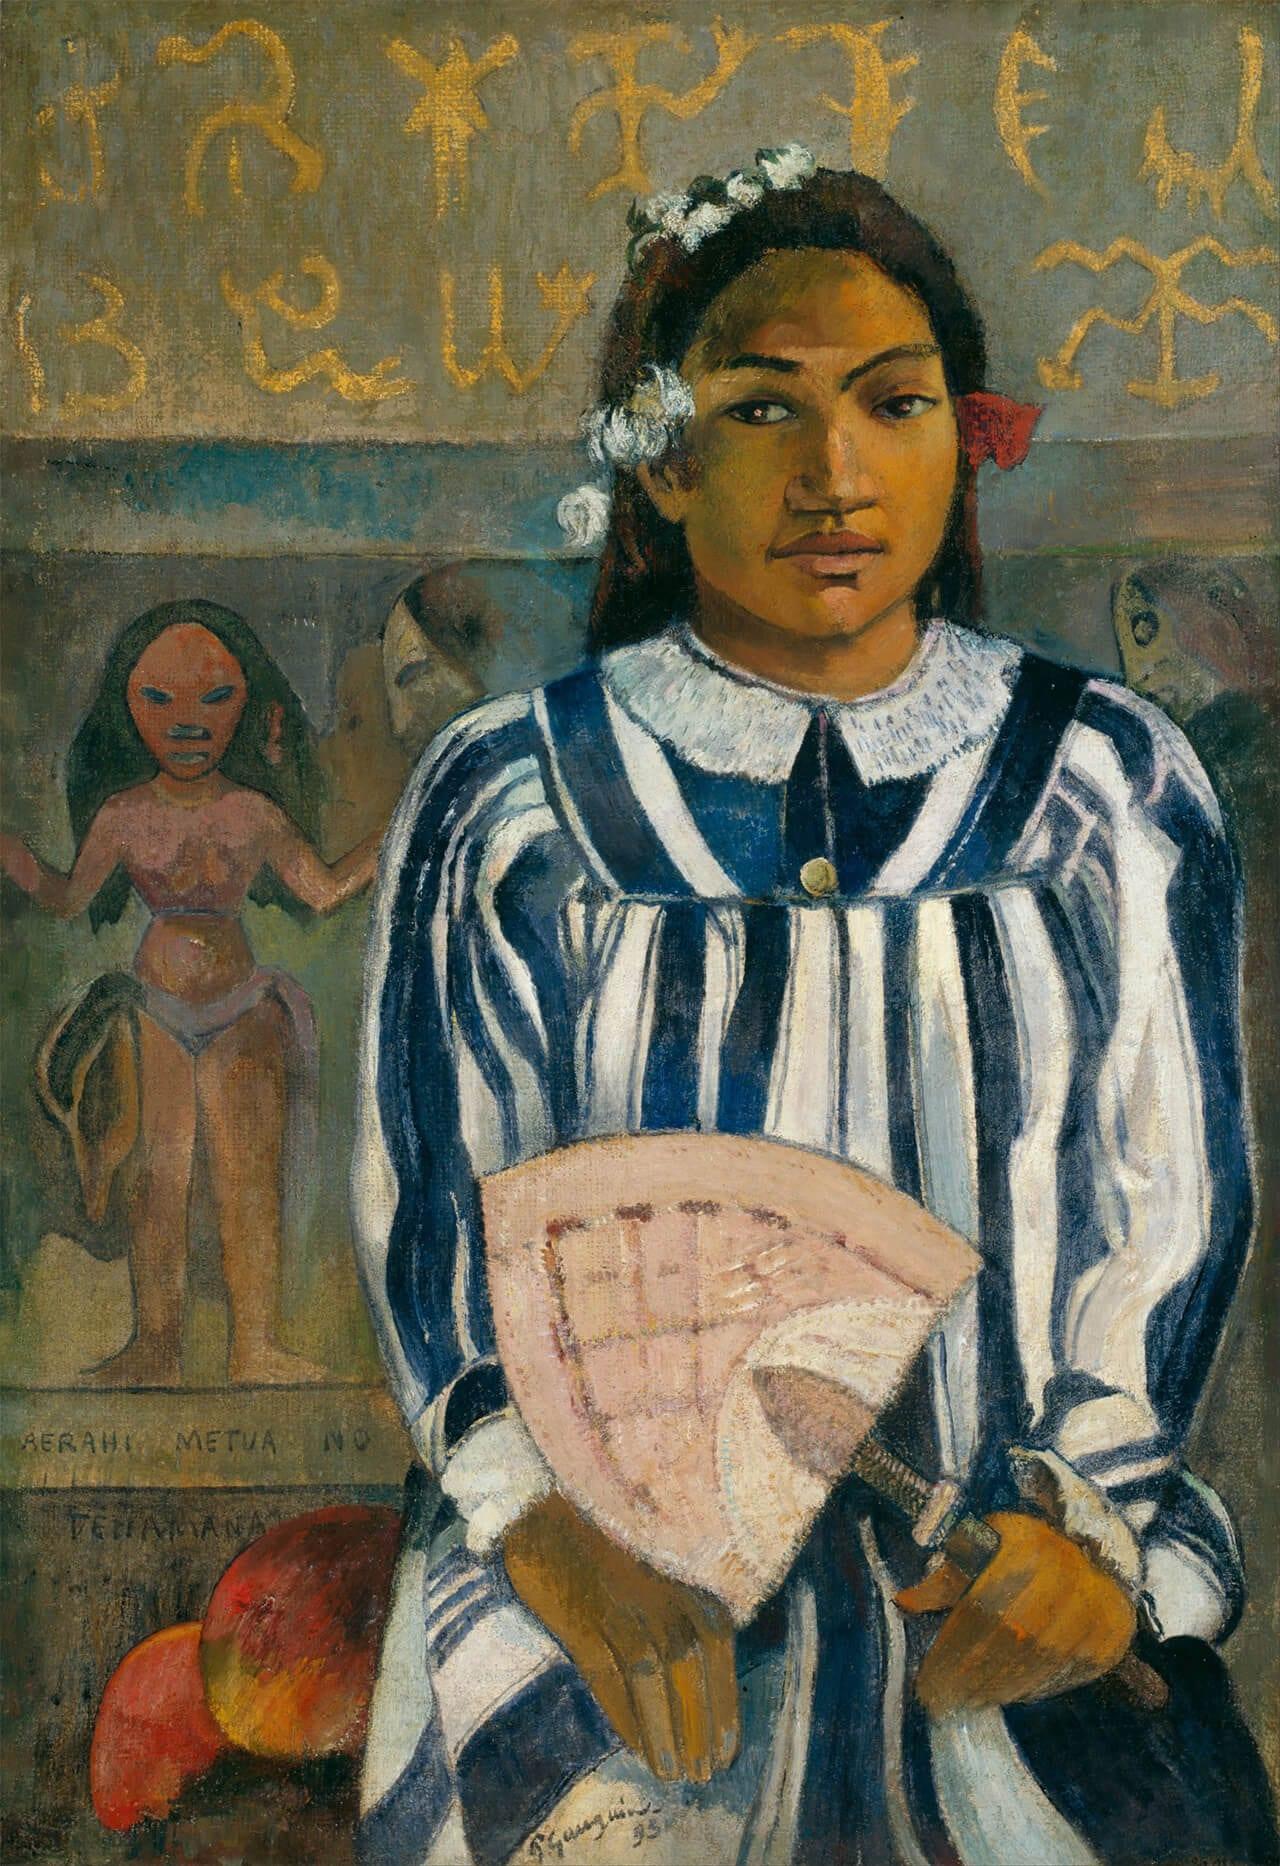 Merahi metua no Teha`amana (Teha`amana hat viele Eltern), 1893 © The Art Institute of Chicago Aus: Der Gauguin Atlas, Sieveking Verlag 2018.